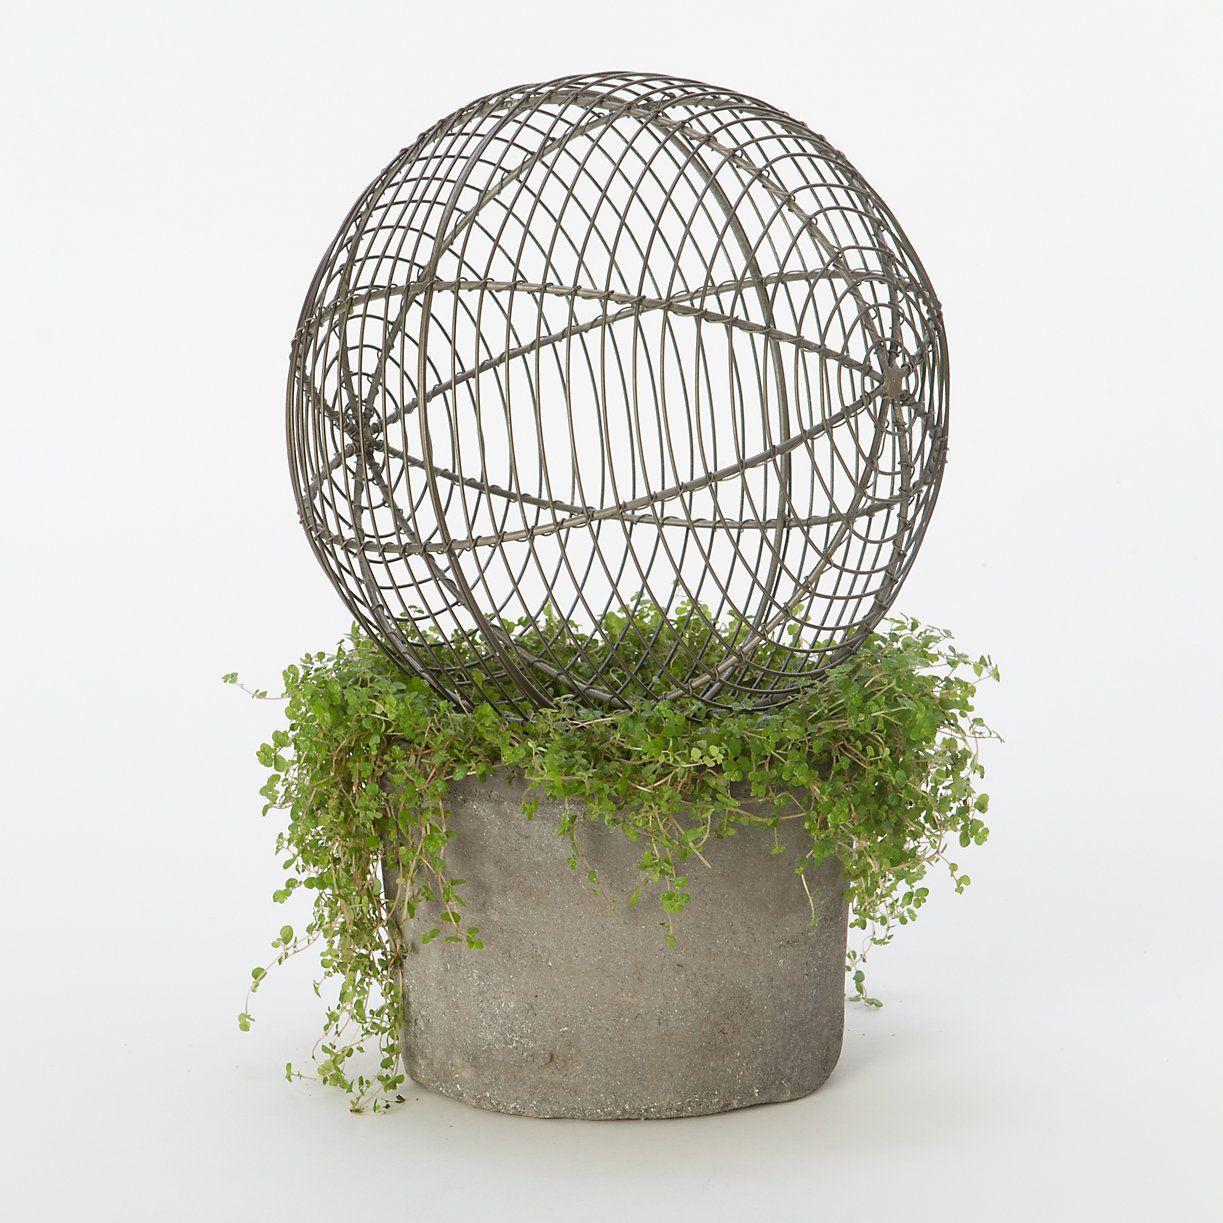 Terrain Wire Garden Sphere Large Shopterrain 8 Size Now 19 95